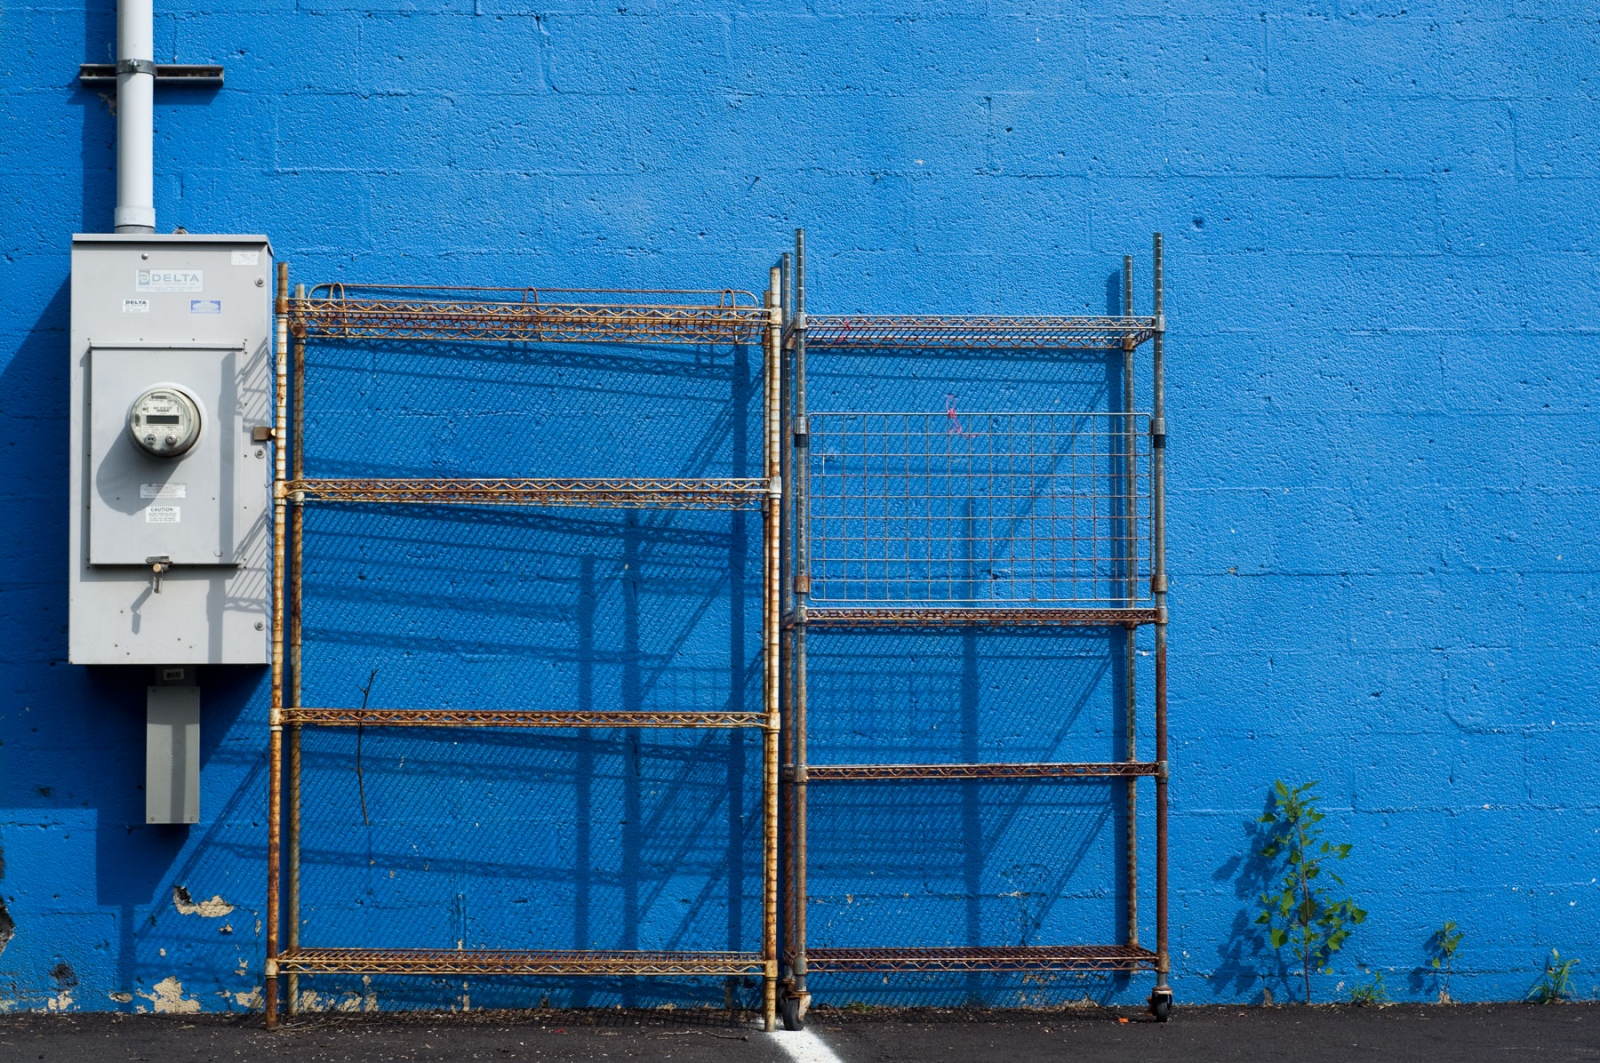 Art and Documentary Photography - Loading metal-racks-blue-wall.jpg